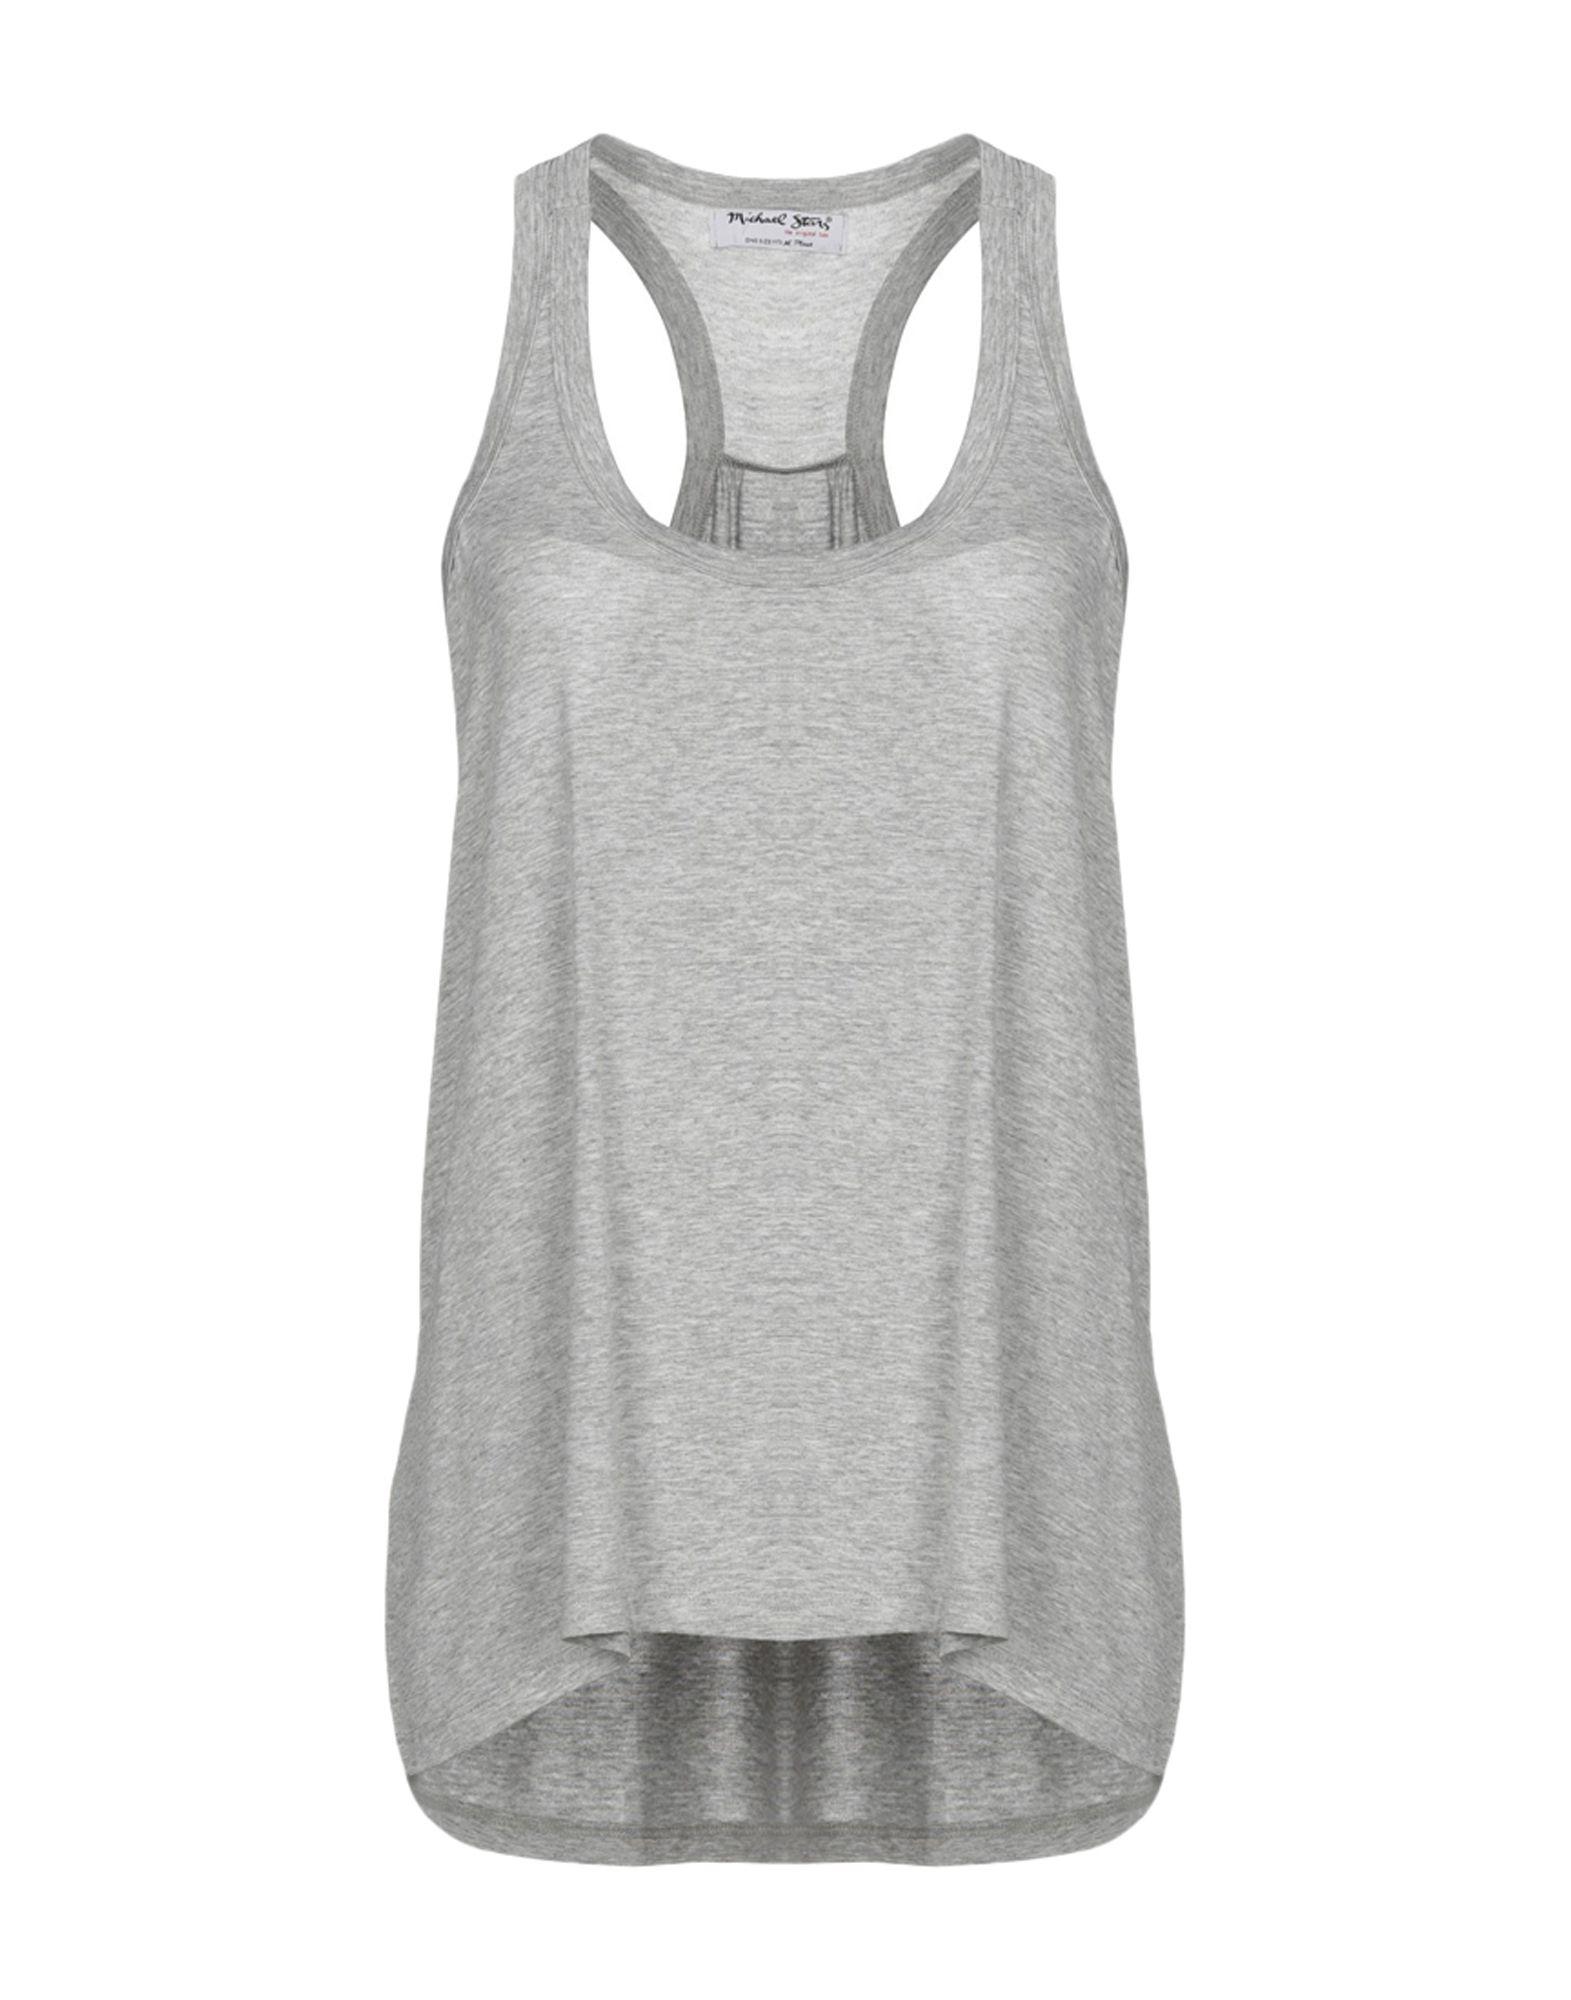 MICHAEL STARS Tank tops. jersey, mélange, no appliqués, solid color, round collar, sleeveless, no pockets, stretch. 95% Rayon, 5% Elastane